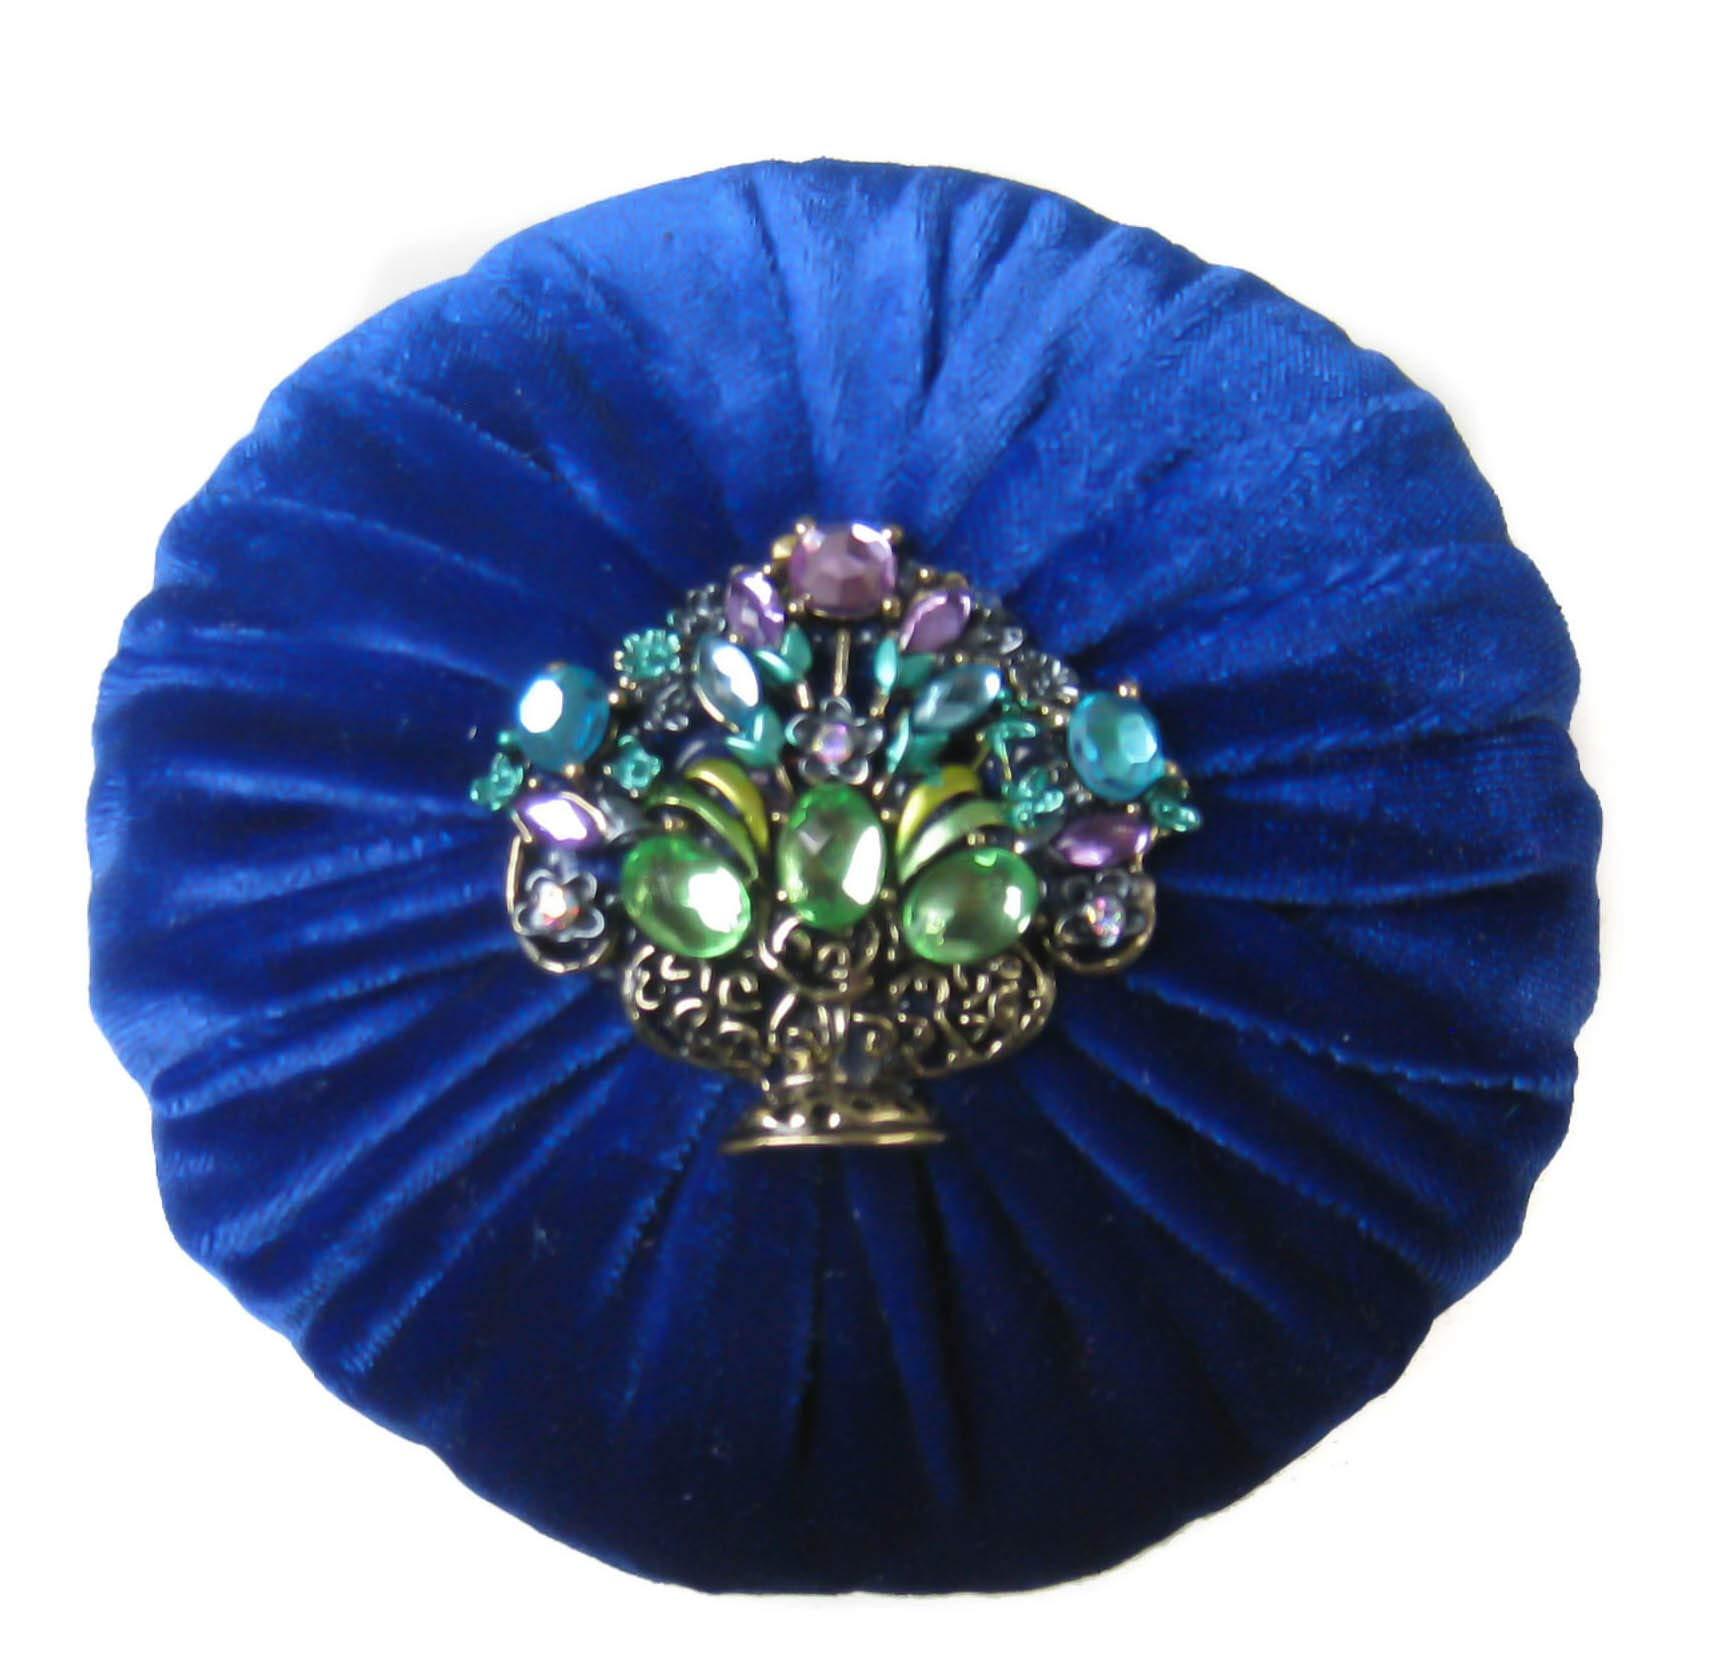 Nakpunar XL Royal Blue Emery Sewing Pincushion - Keep Your Needles Clean and Sharp by Nakpunar